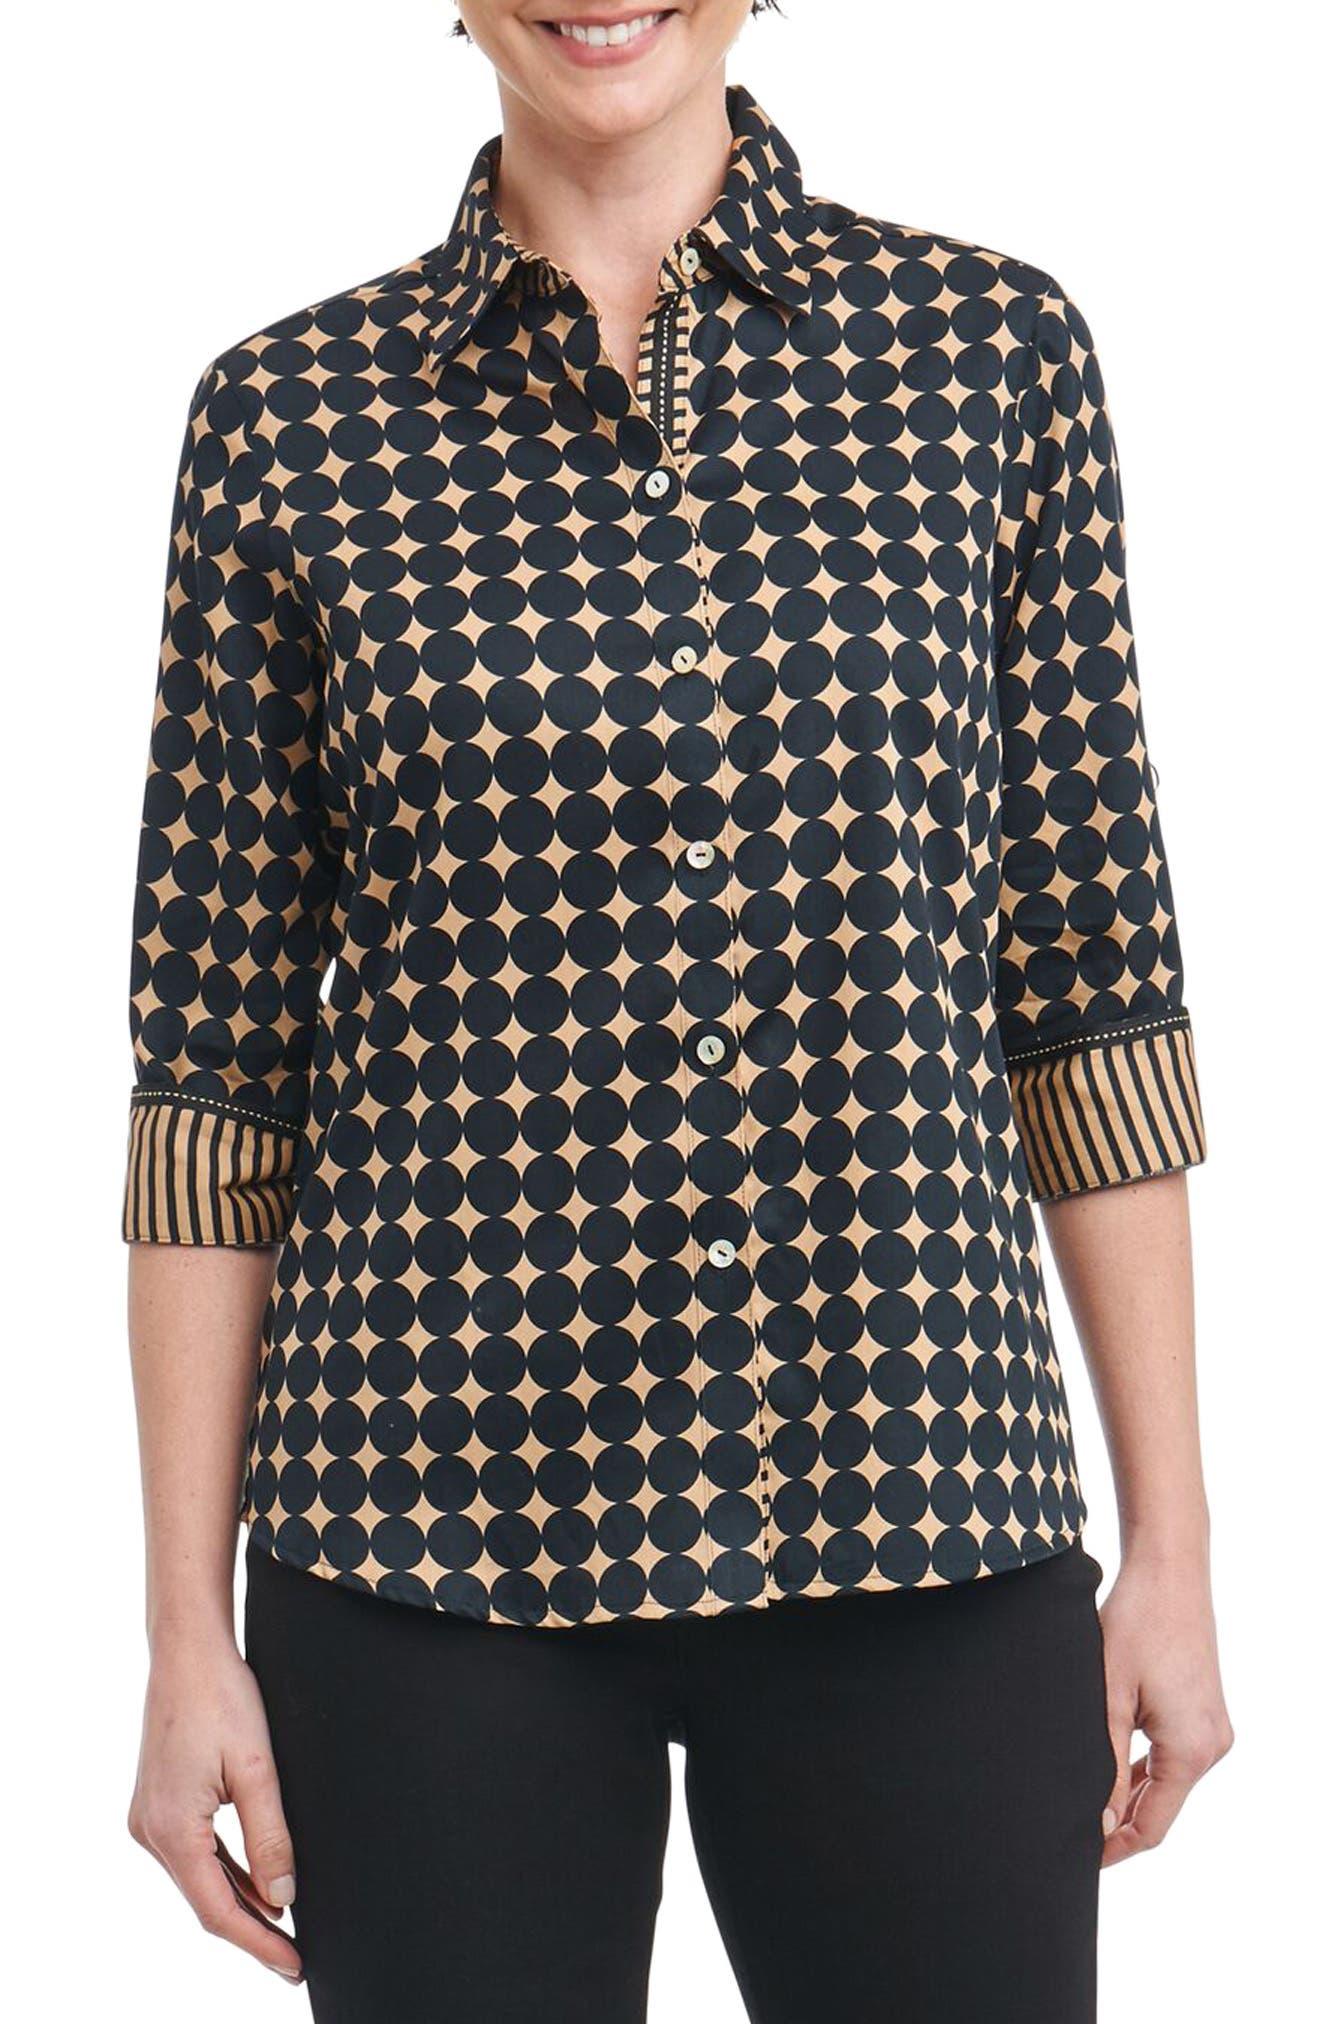 Alternate Image 1 Selected - Foxcroft Ava Non-Iron Dot Print Cotton Shirt (Regular & Petite)